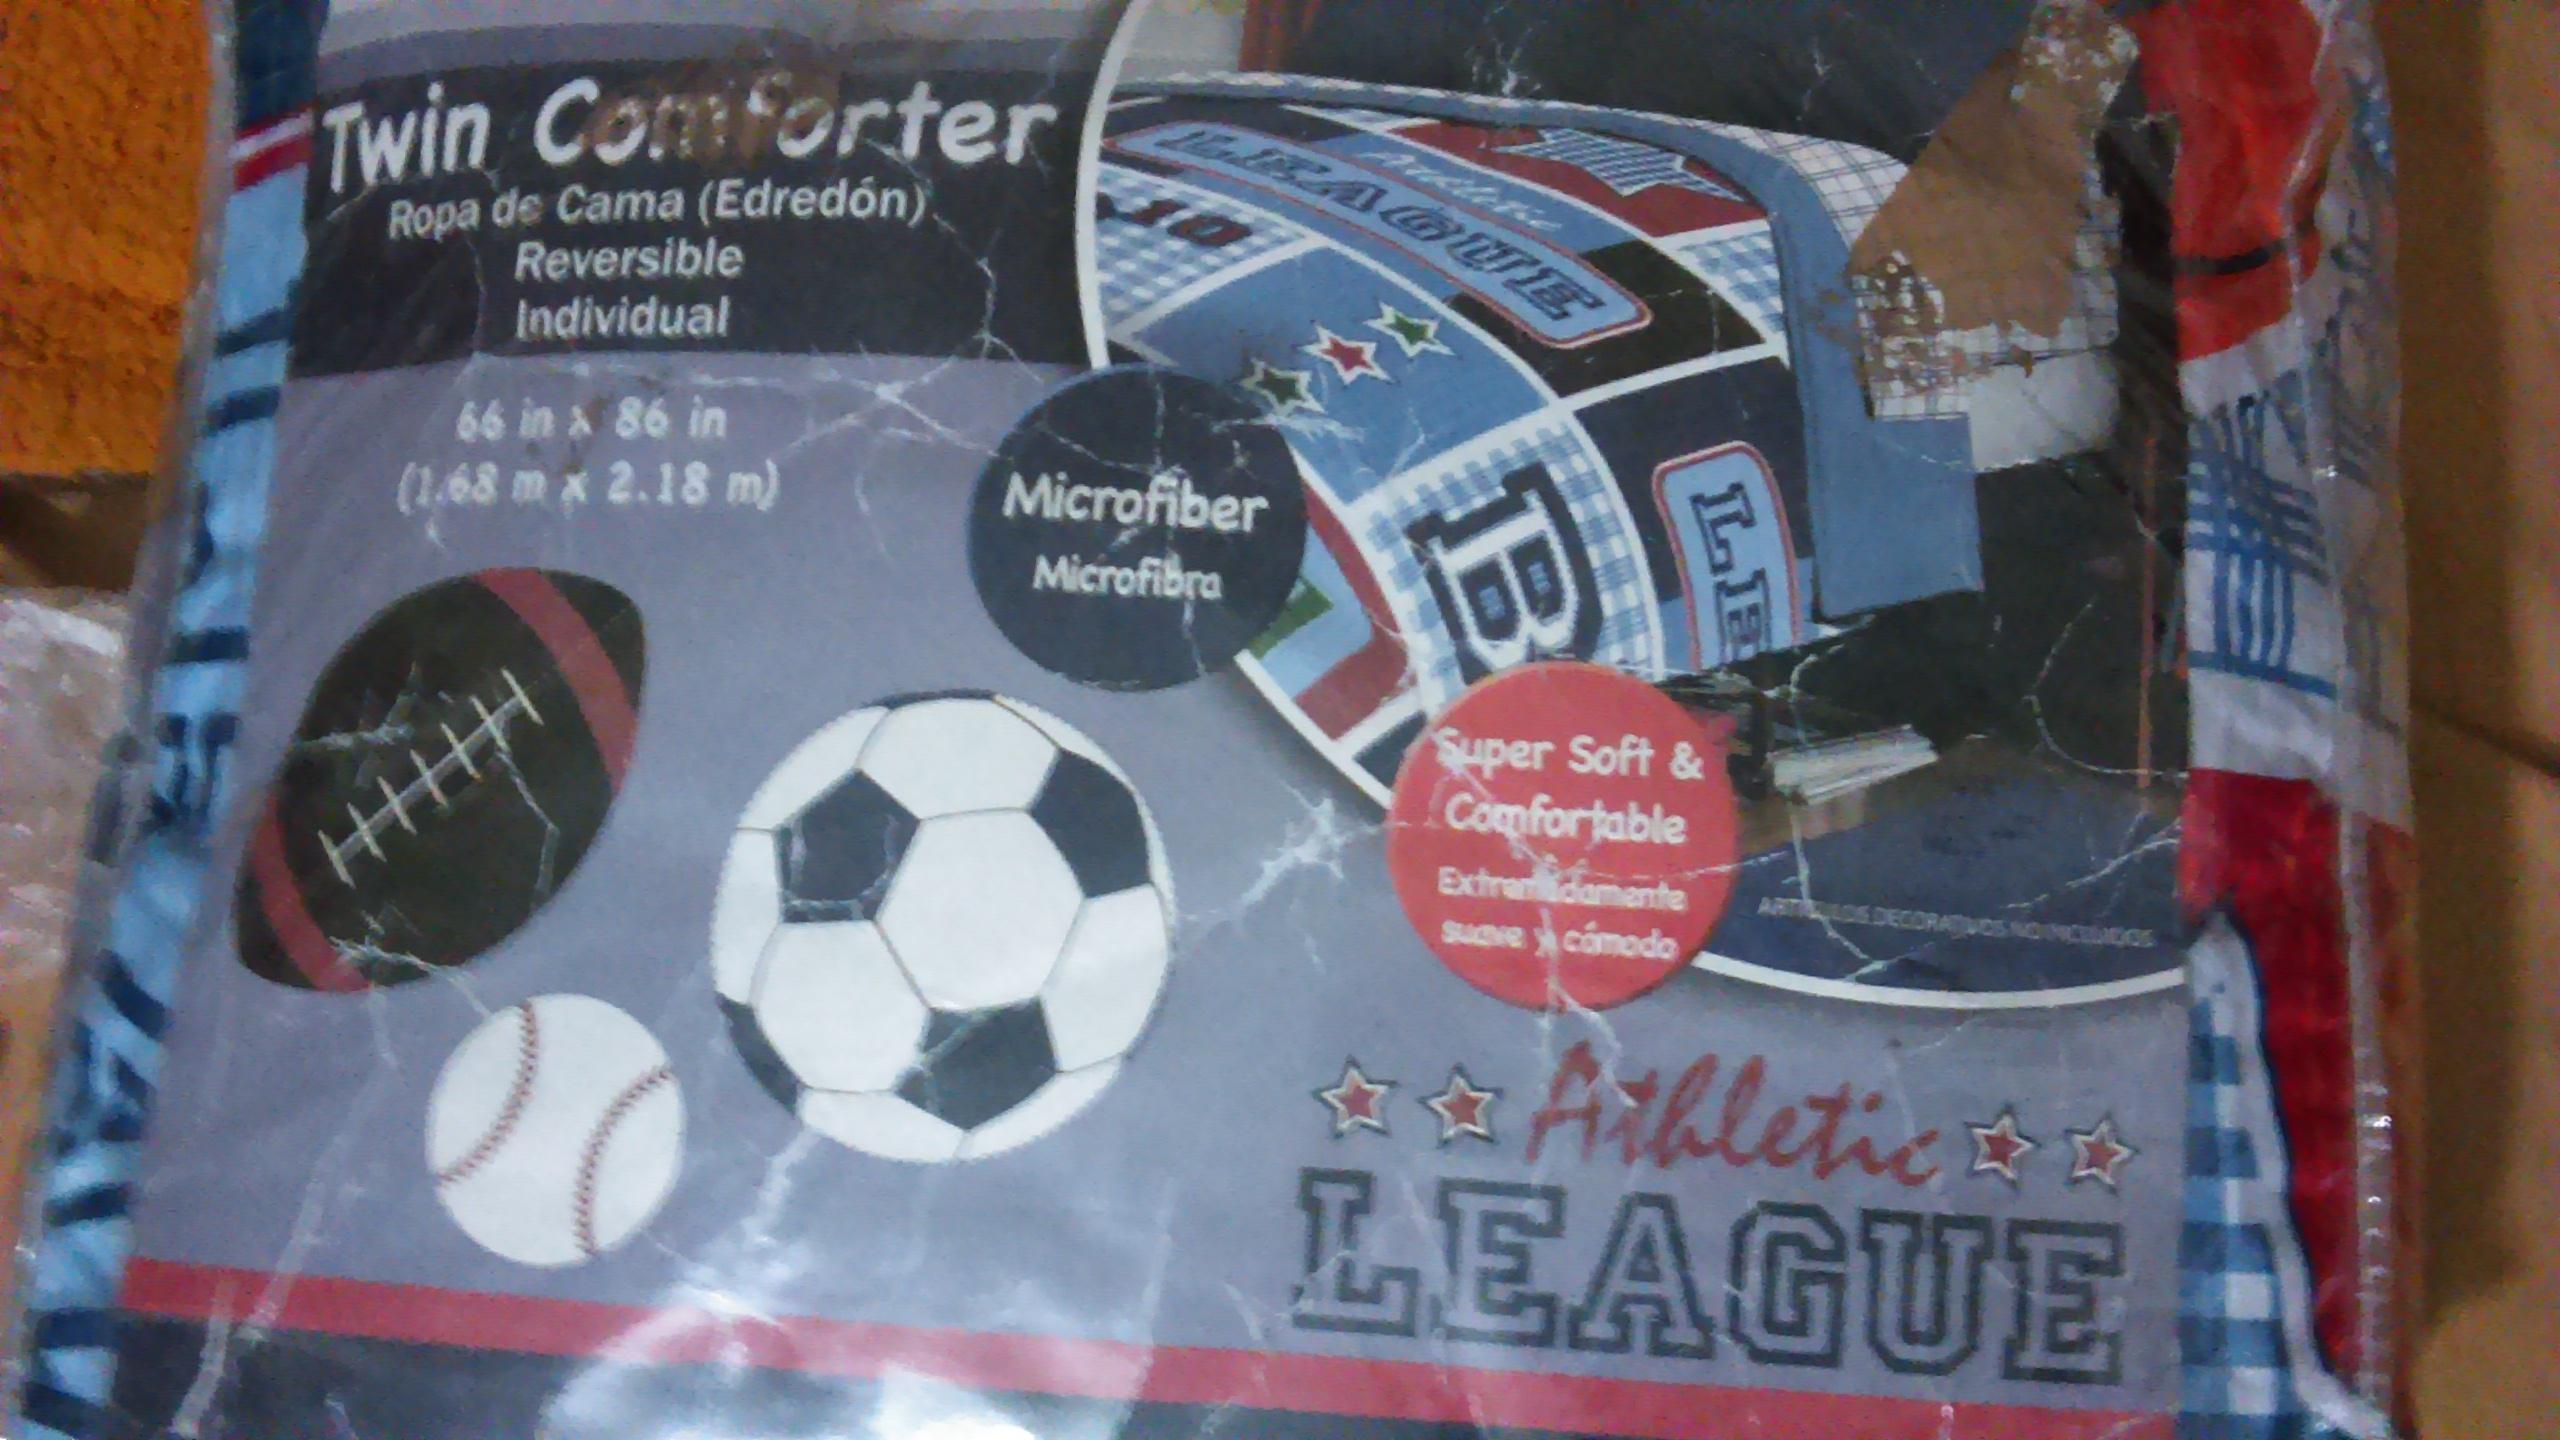 Walmart Ciudad Jardin: Edredon Individual Sport $50